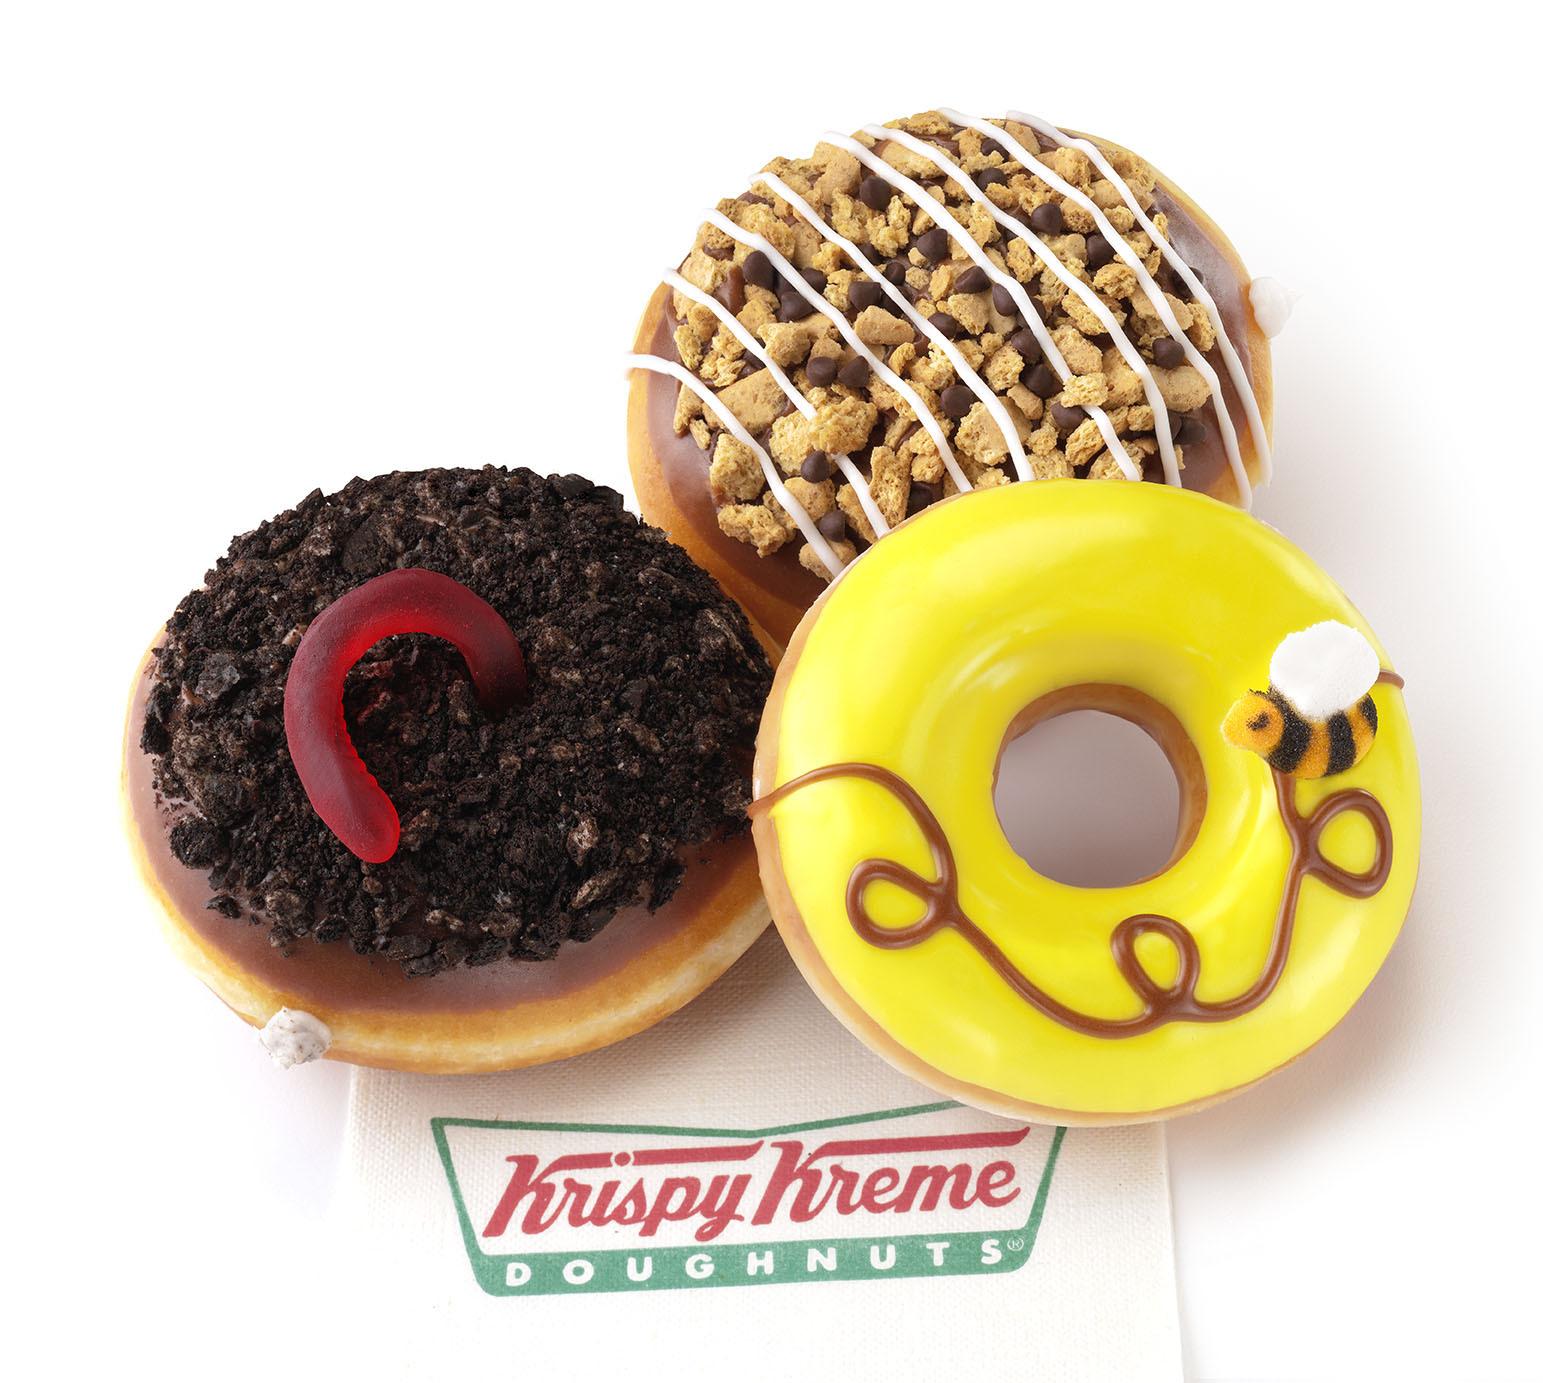 Krispy Kreme Oreo Dirt Cake The New Oreo® Dirt Cake